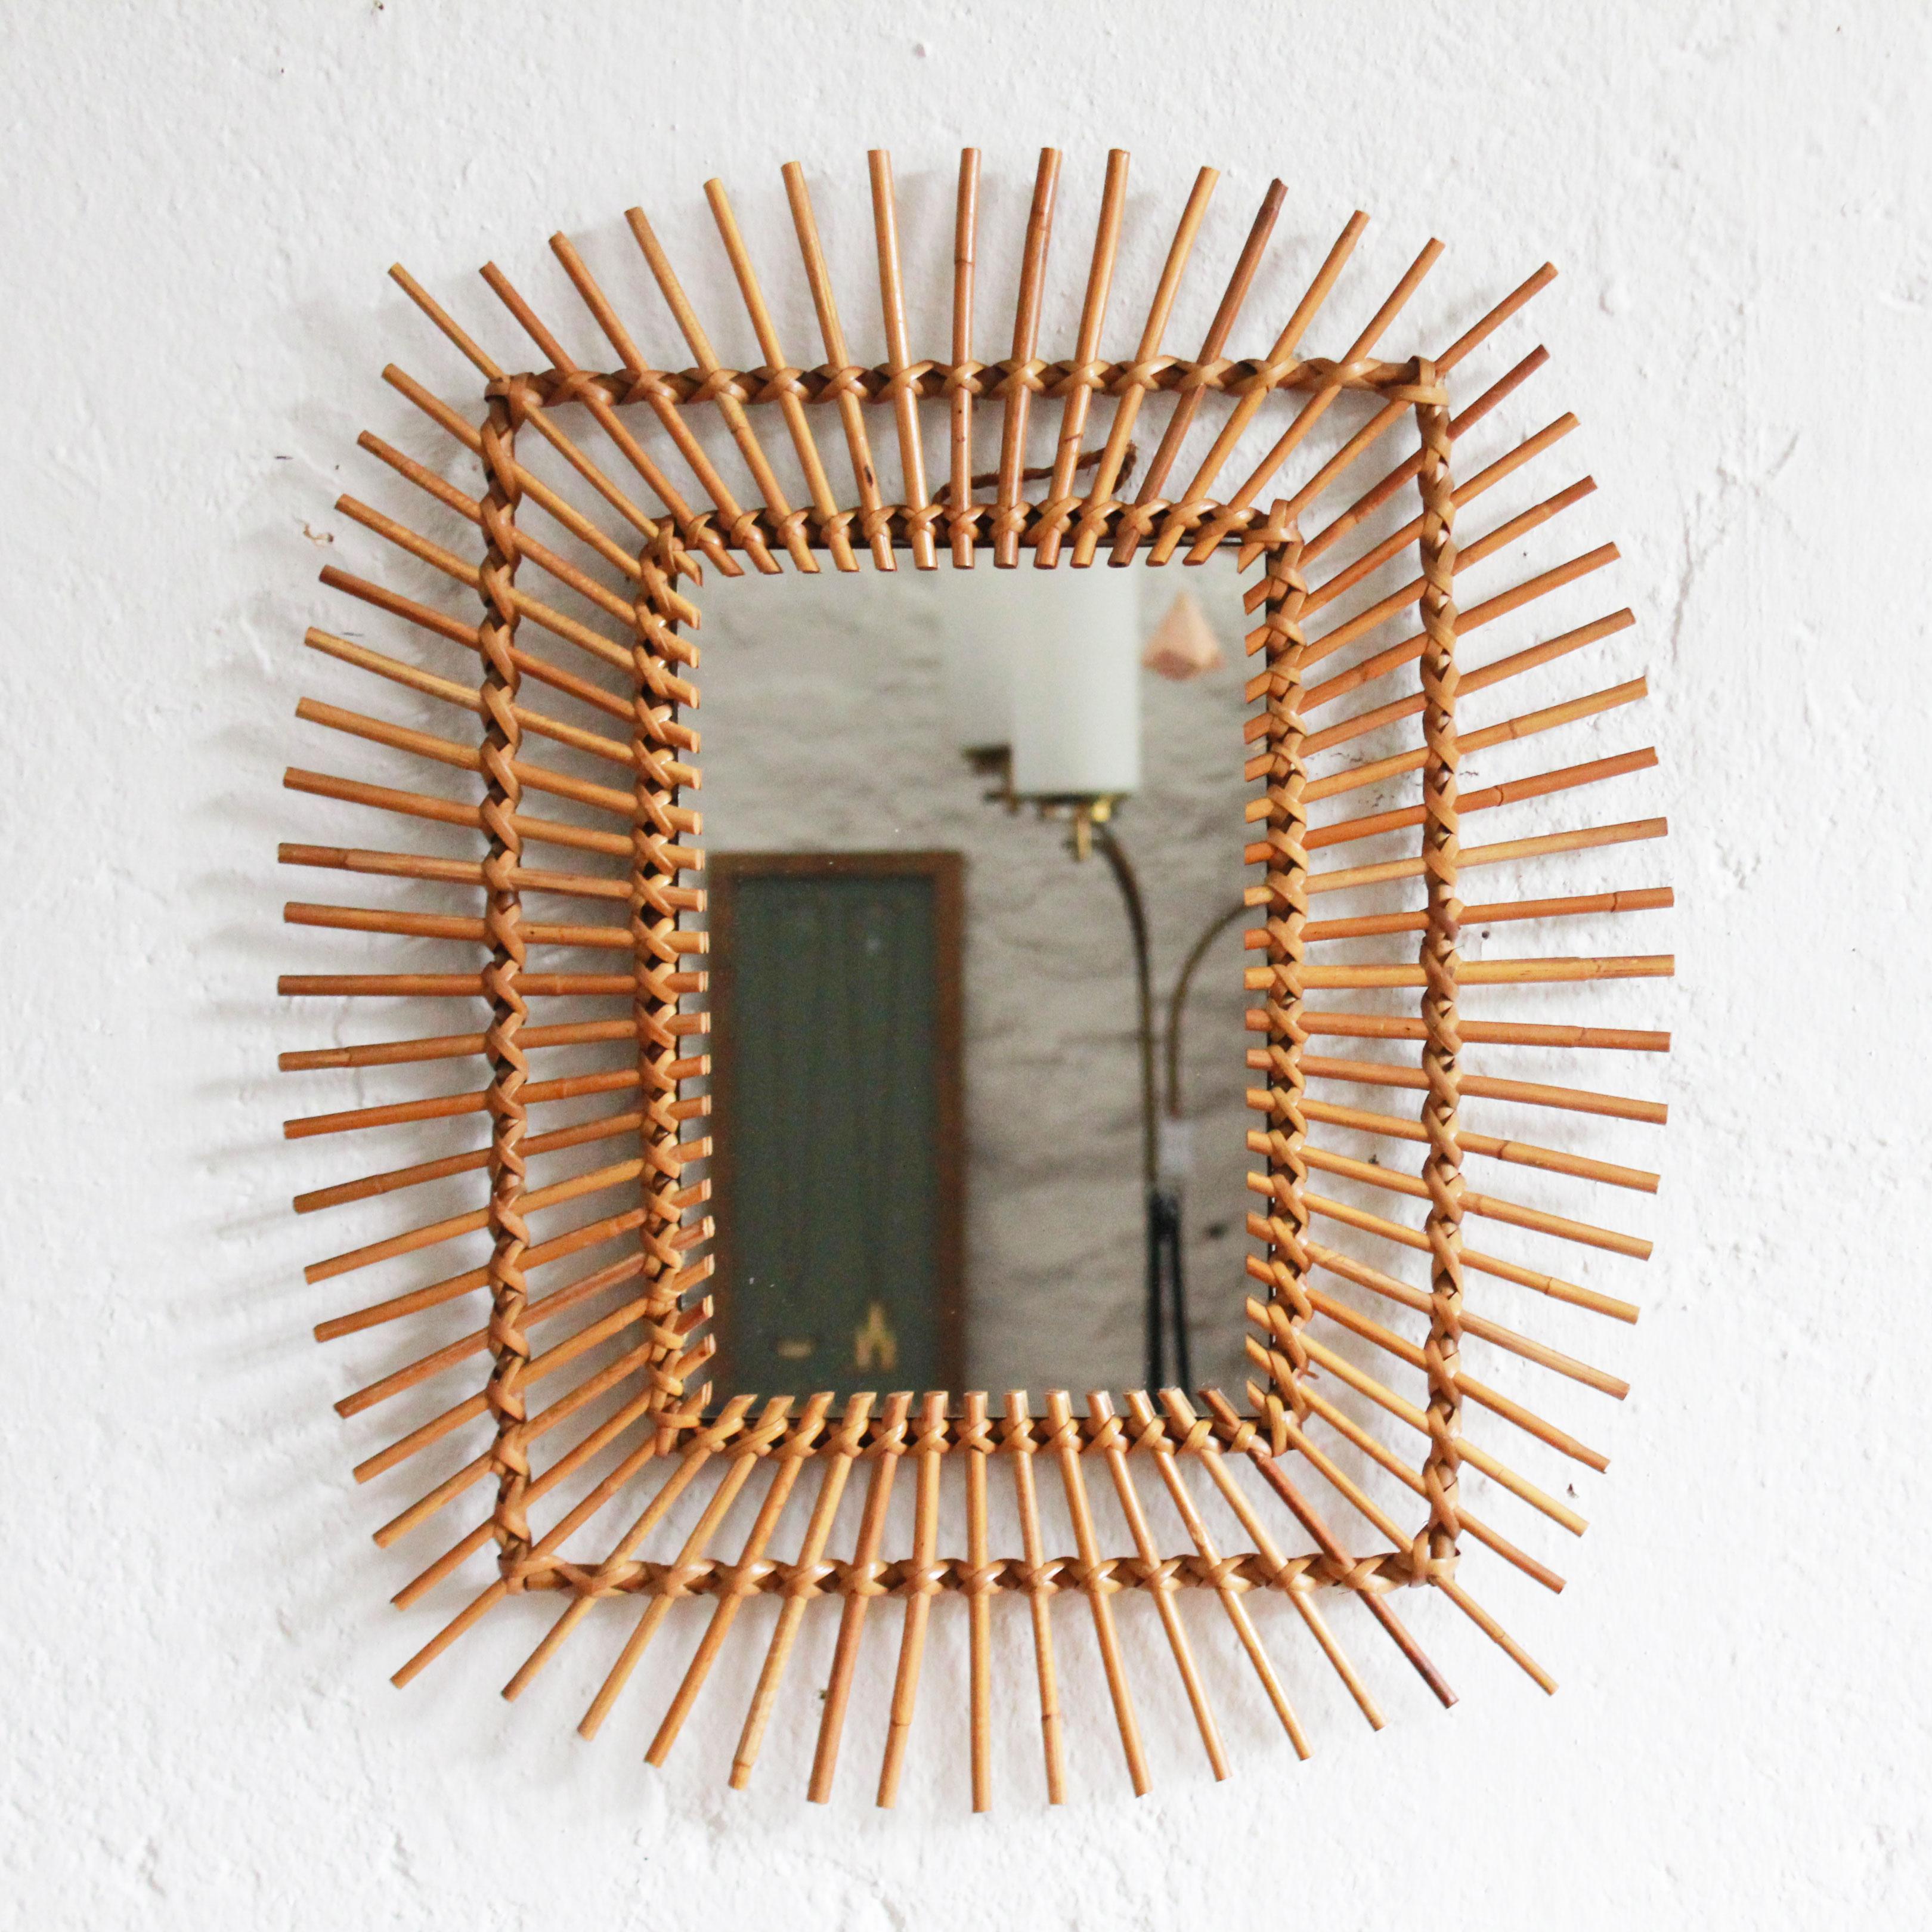 Miroir-rotin-vintage-a_E613